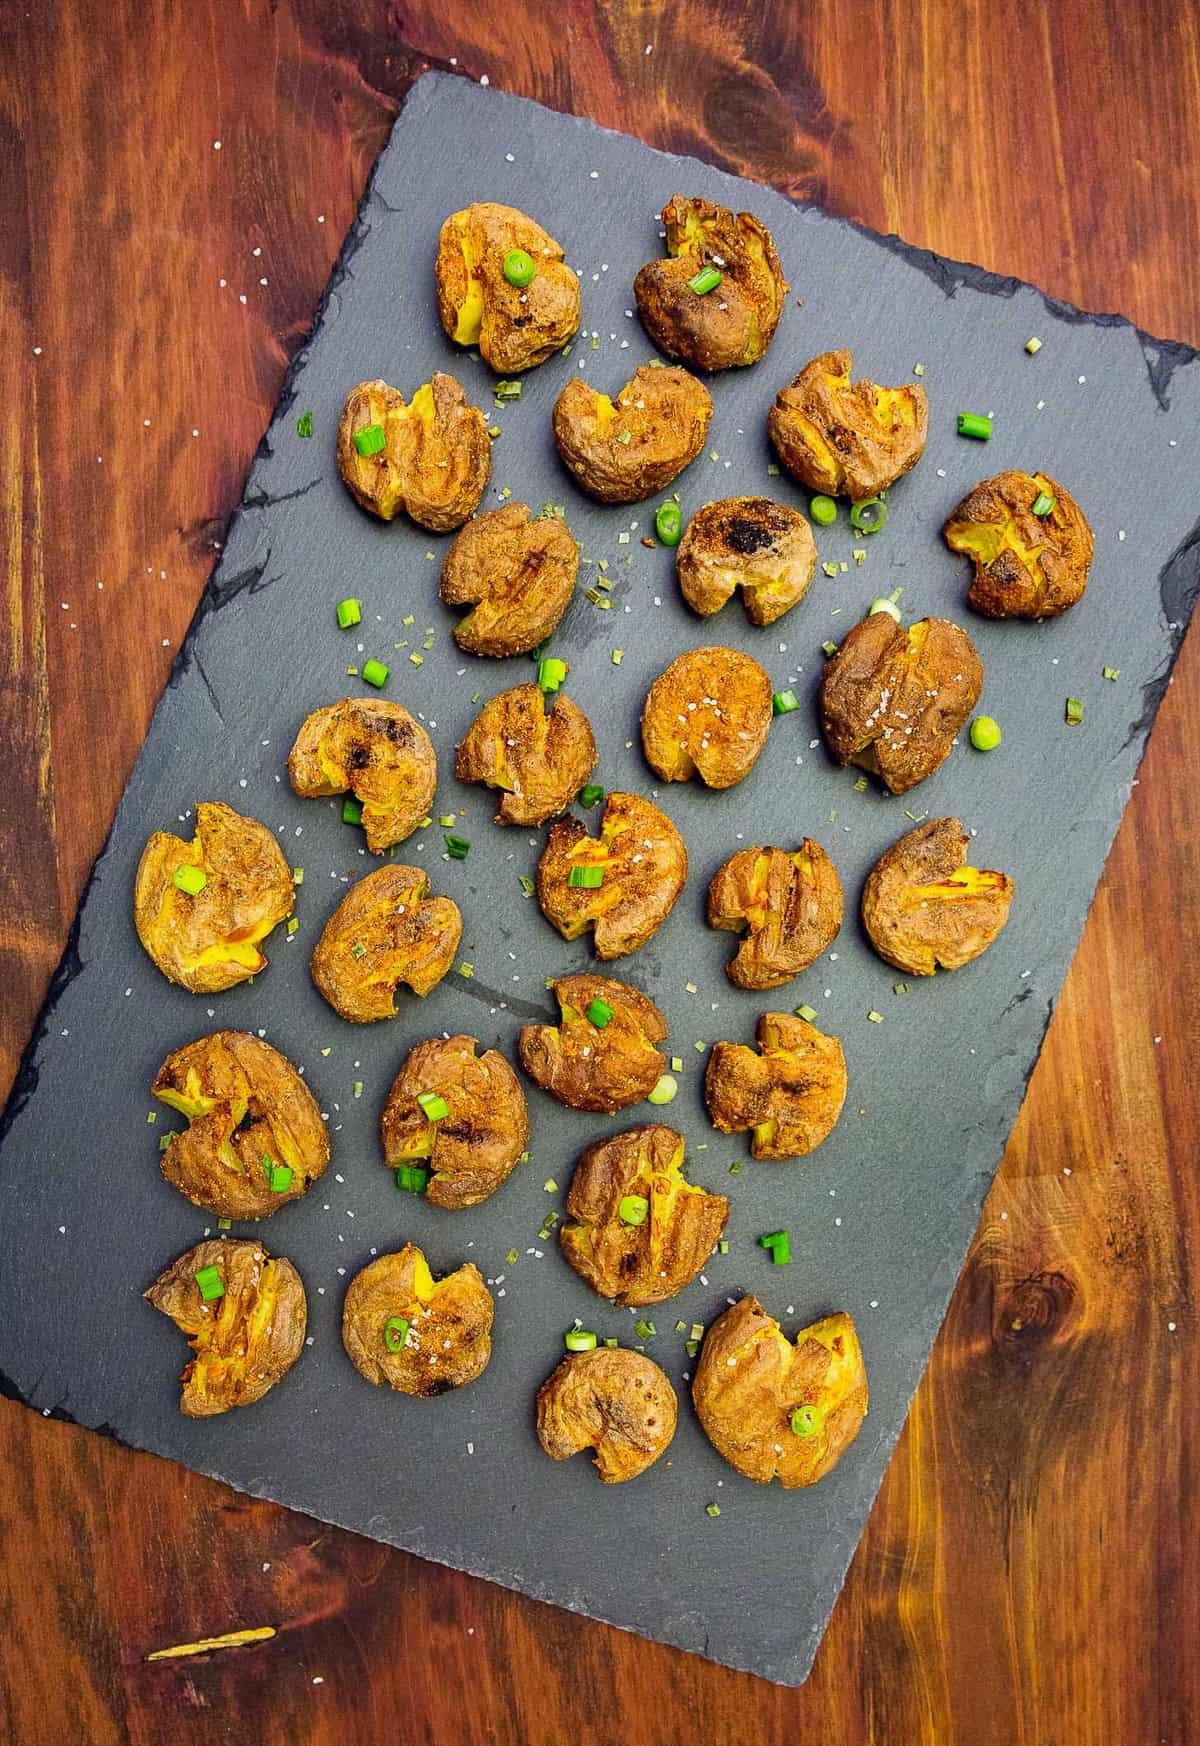 garlic smashed baby potatoes, garlic smashed potatoes, garlic potatoes, potatoes, vegan, vegetarian, whole food plant based, plant based, healthy, gluten free, oil free, no oil, garlic, baby potatoes, vegan recipe, vegetarian recipe, whole food plant based recipe, gluten free recipe, oil free recipe, vegan potatoes, vegetarian potatoes, whole food plant based potatoes, healthy potatoes, healthy recipe, easy, simple, entertaining, dinner, side dish, side, meals